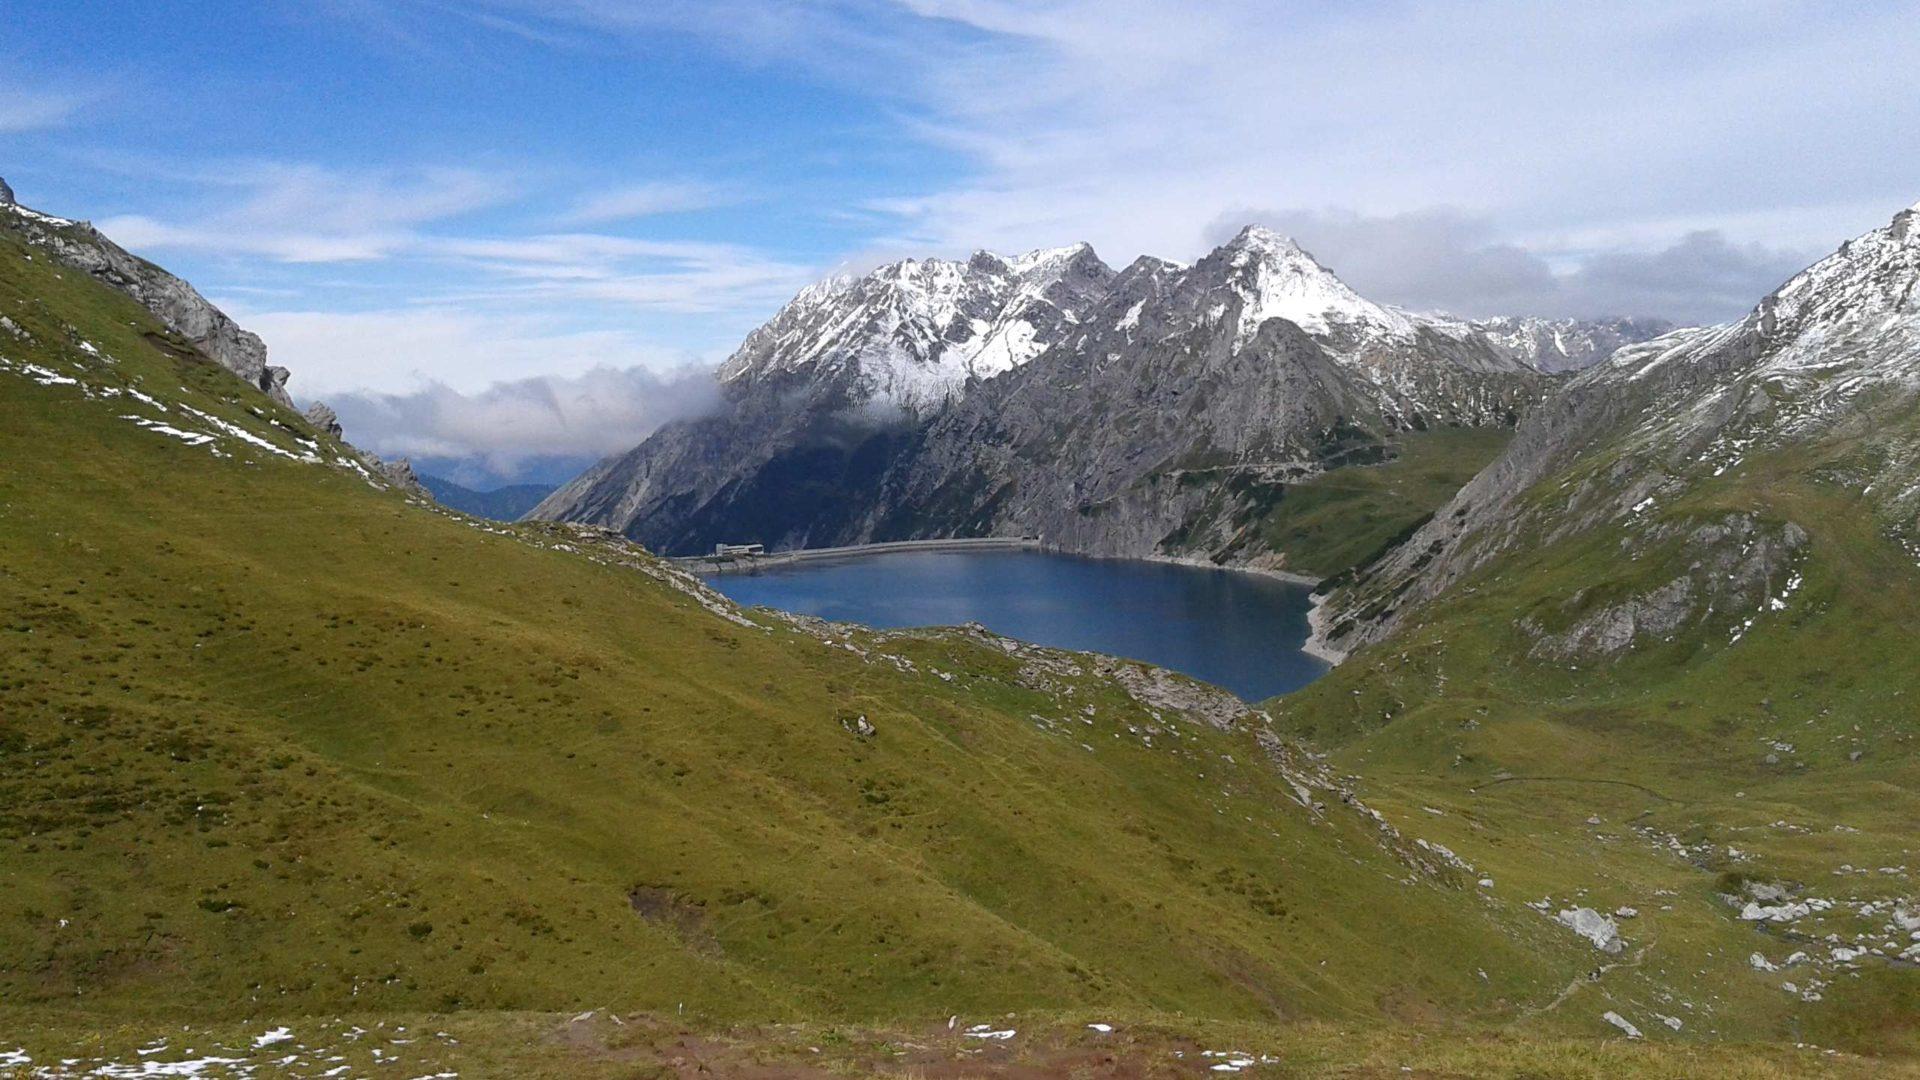 Raetikon, Lünersee, Wandern, Brandnertal im Herbst in Vorarlberg (c) Verena Hetzenauer / Vorarlberg Tourismus